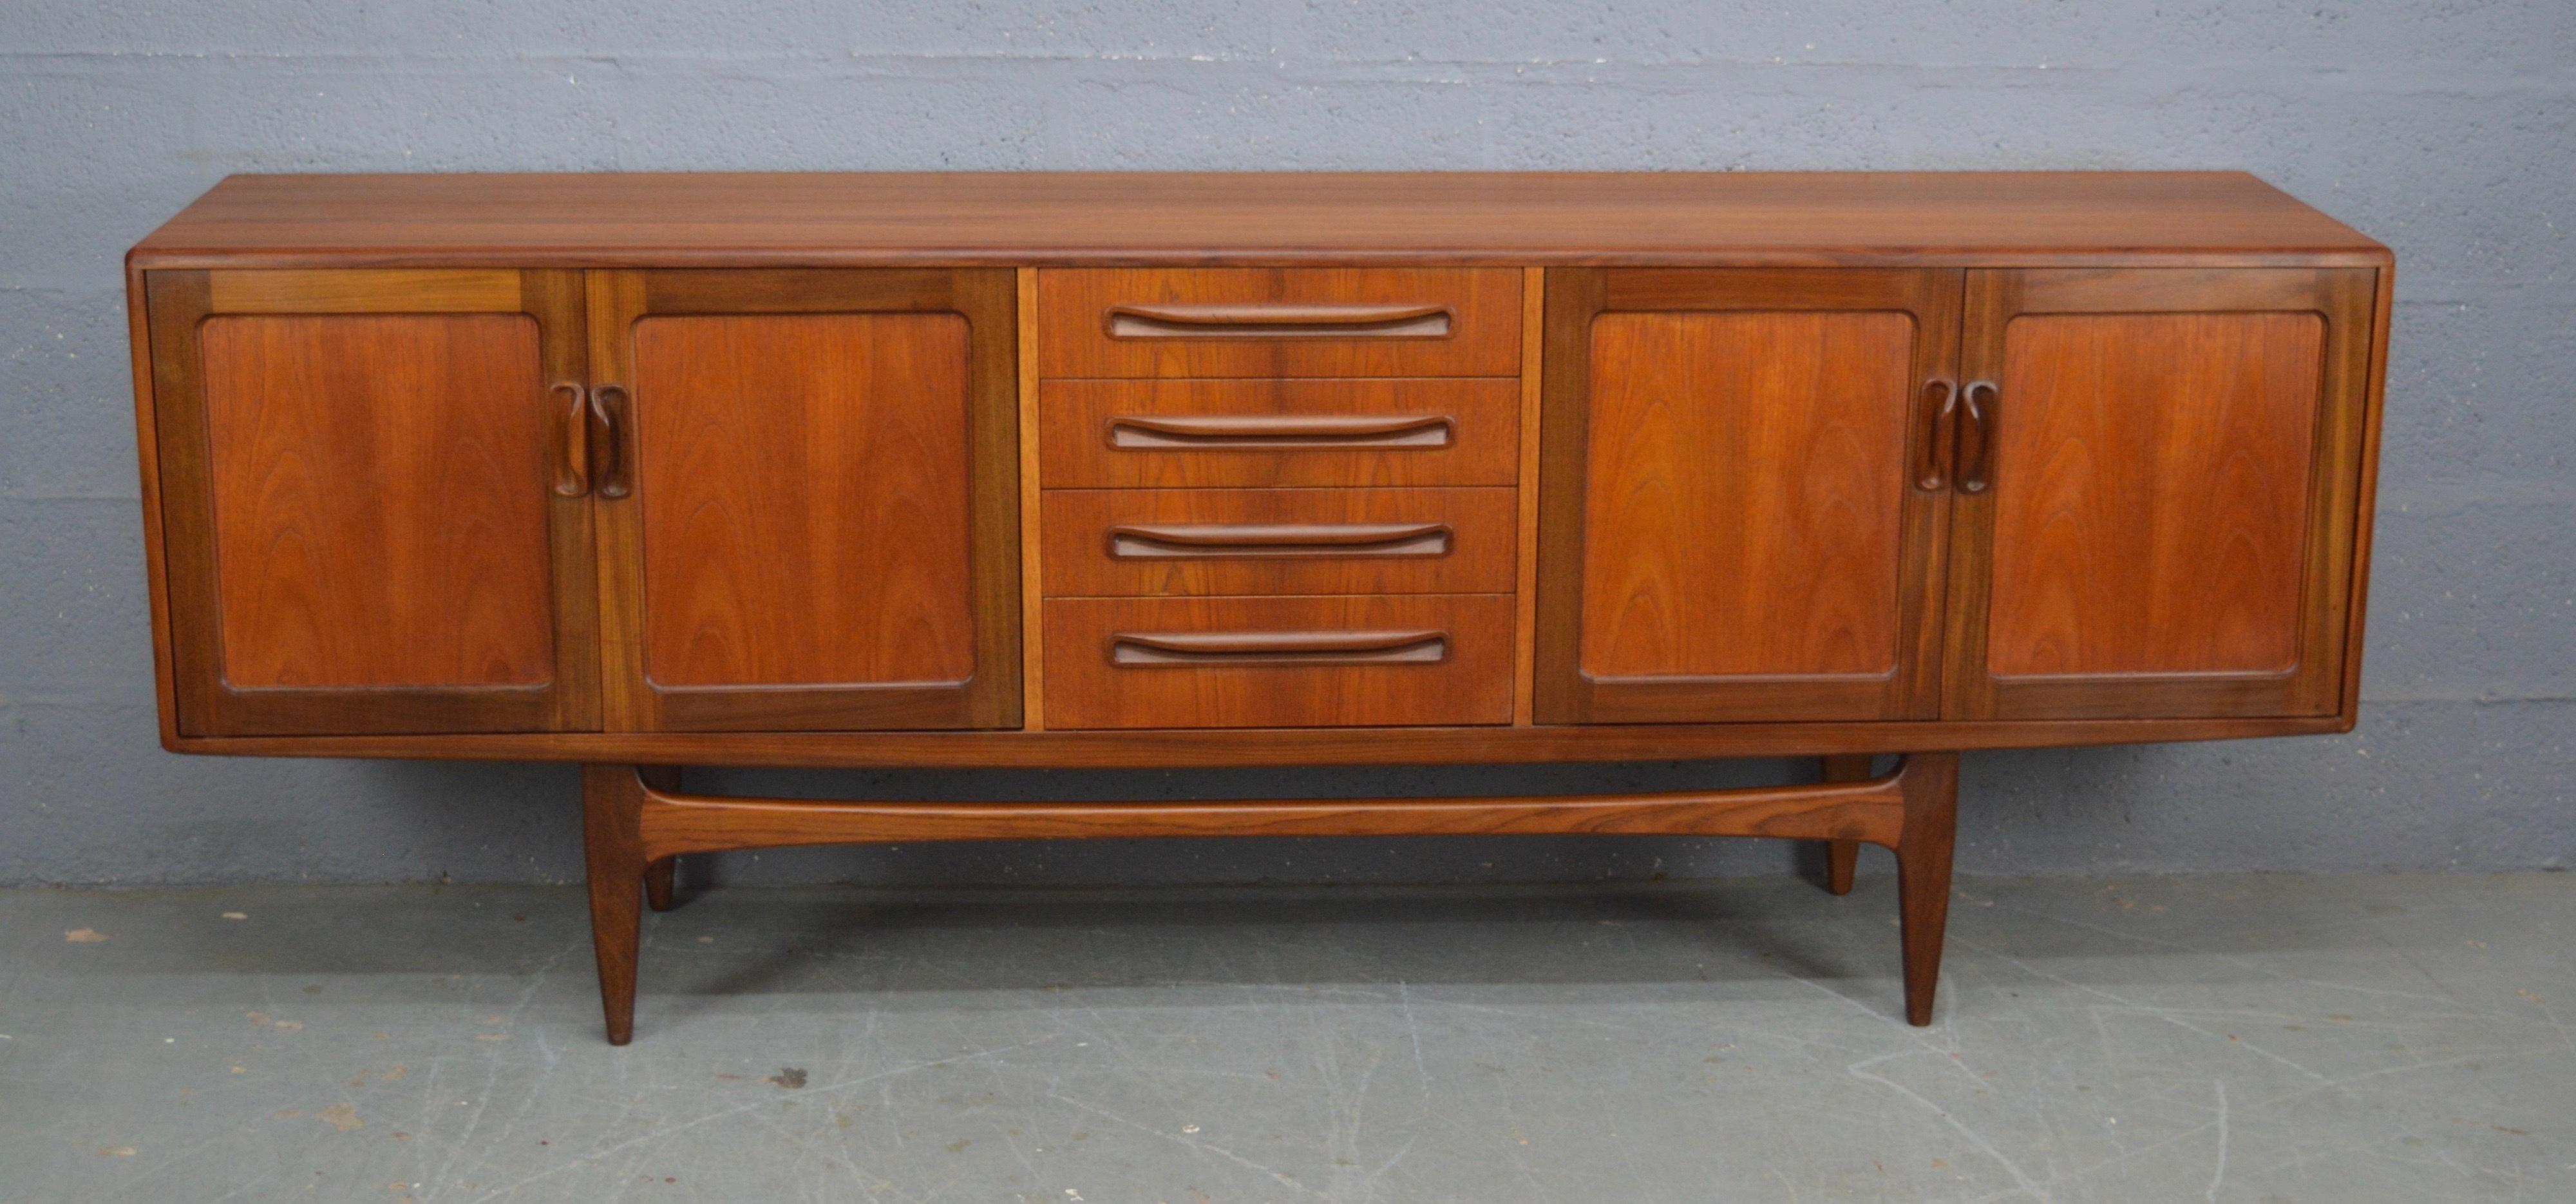 mid century original sideboard vintage